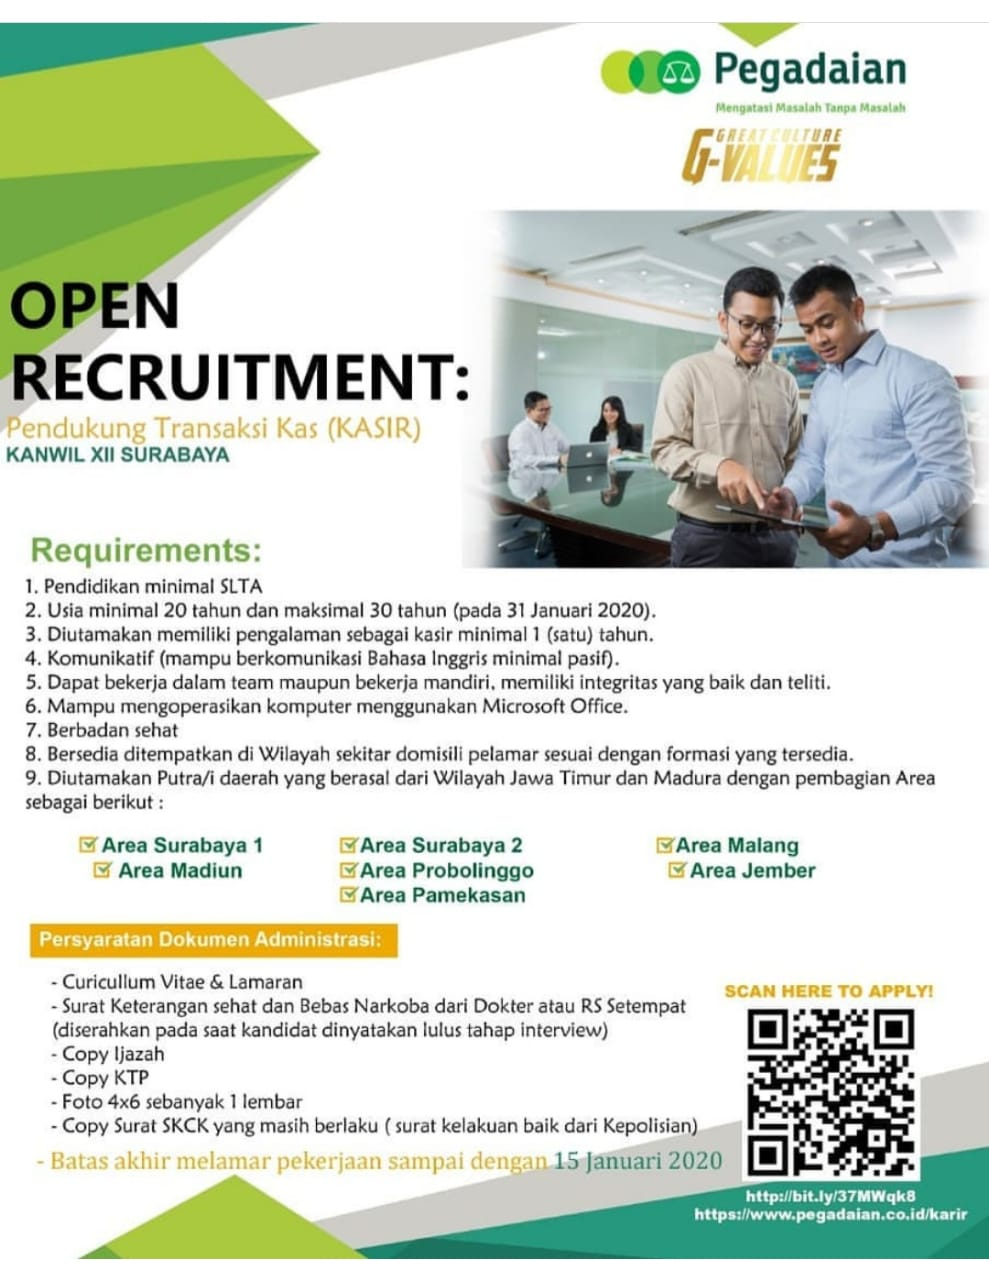 Lowongan Kerja  Pegadaian Terbaru Jawa Timur 2020